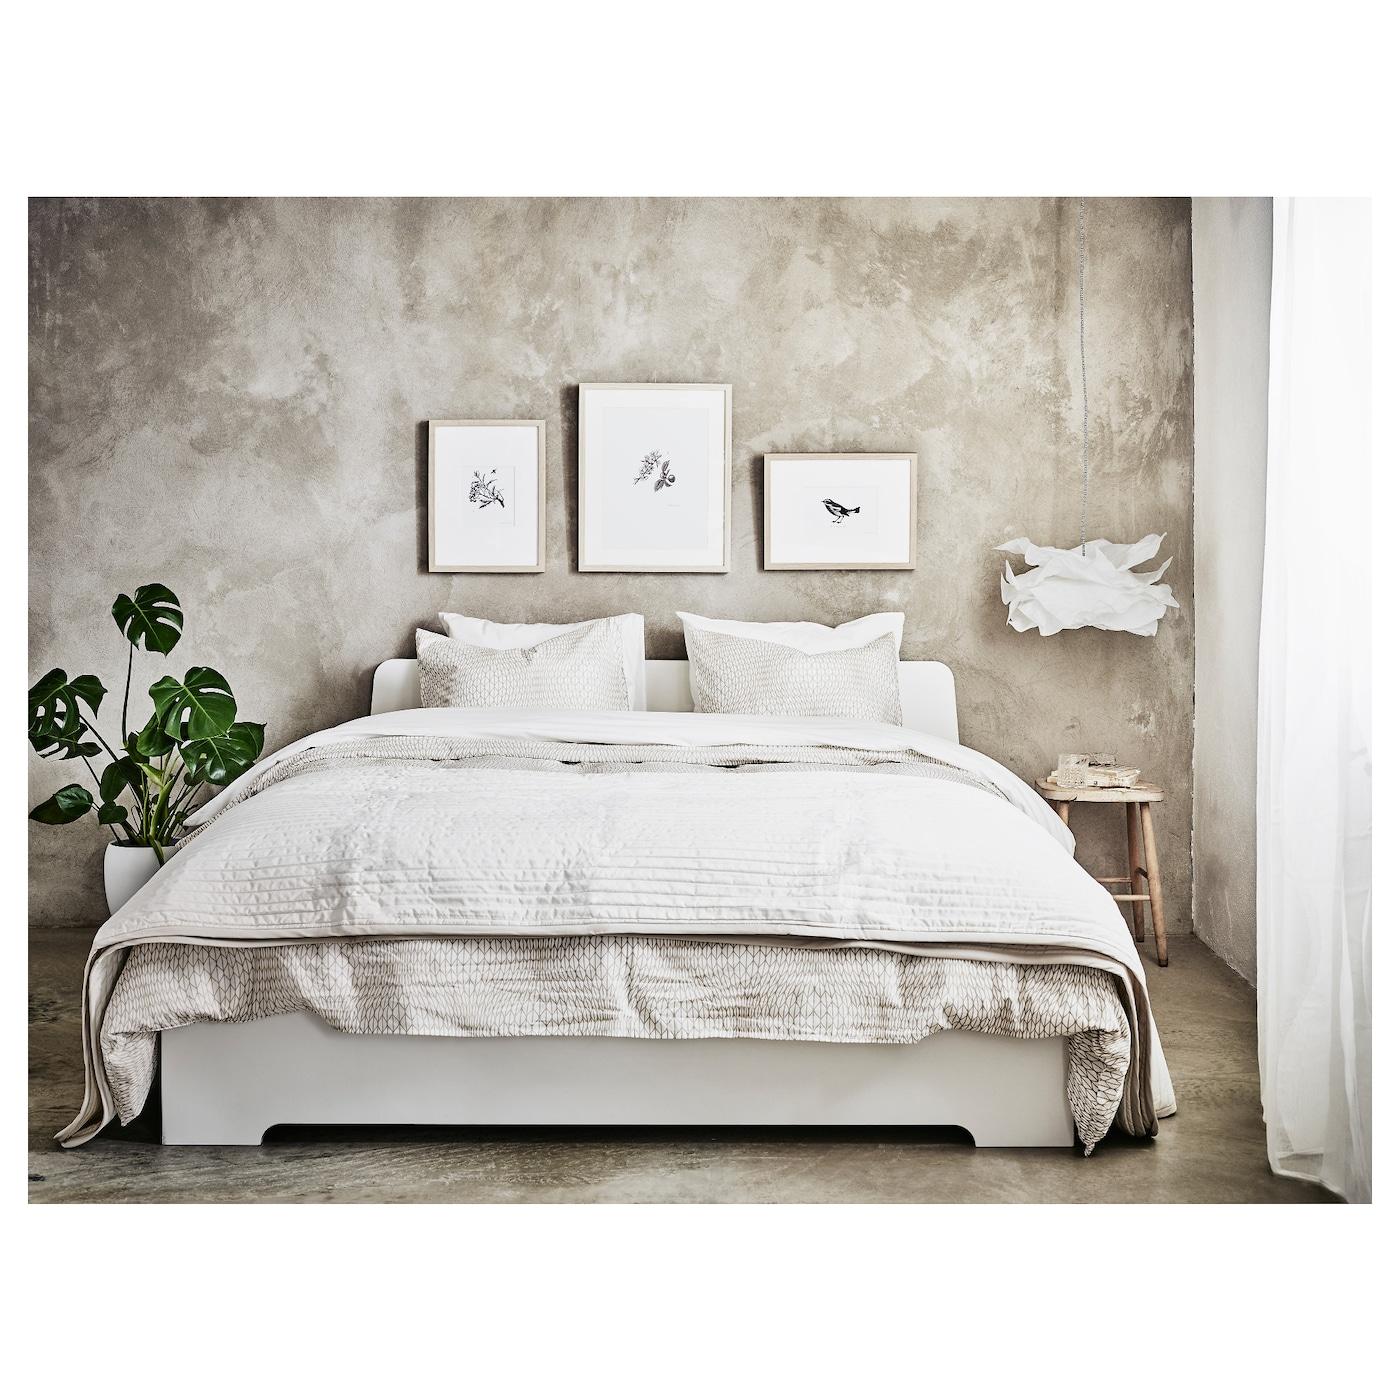 askvoll cadre de lit blanc 160 x 200 cm ikea. Black Bedroom Furniture Sets. Home Design Ideas